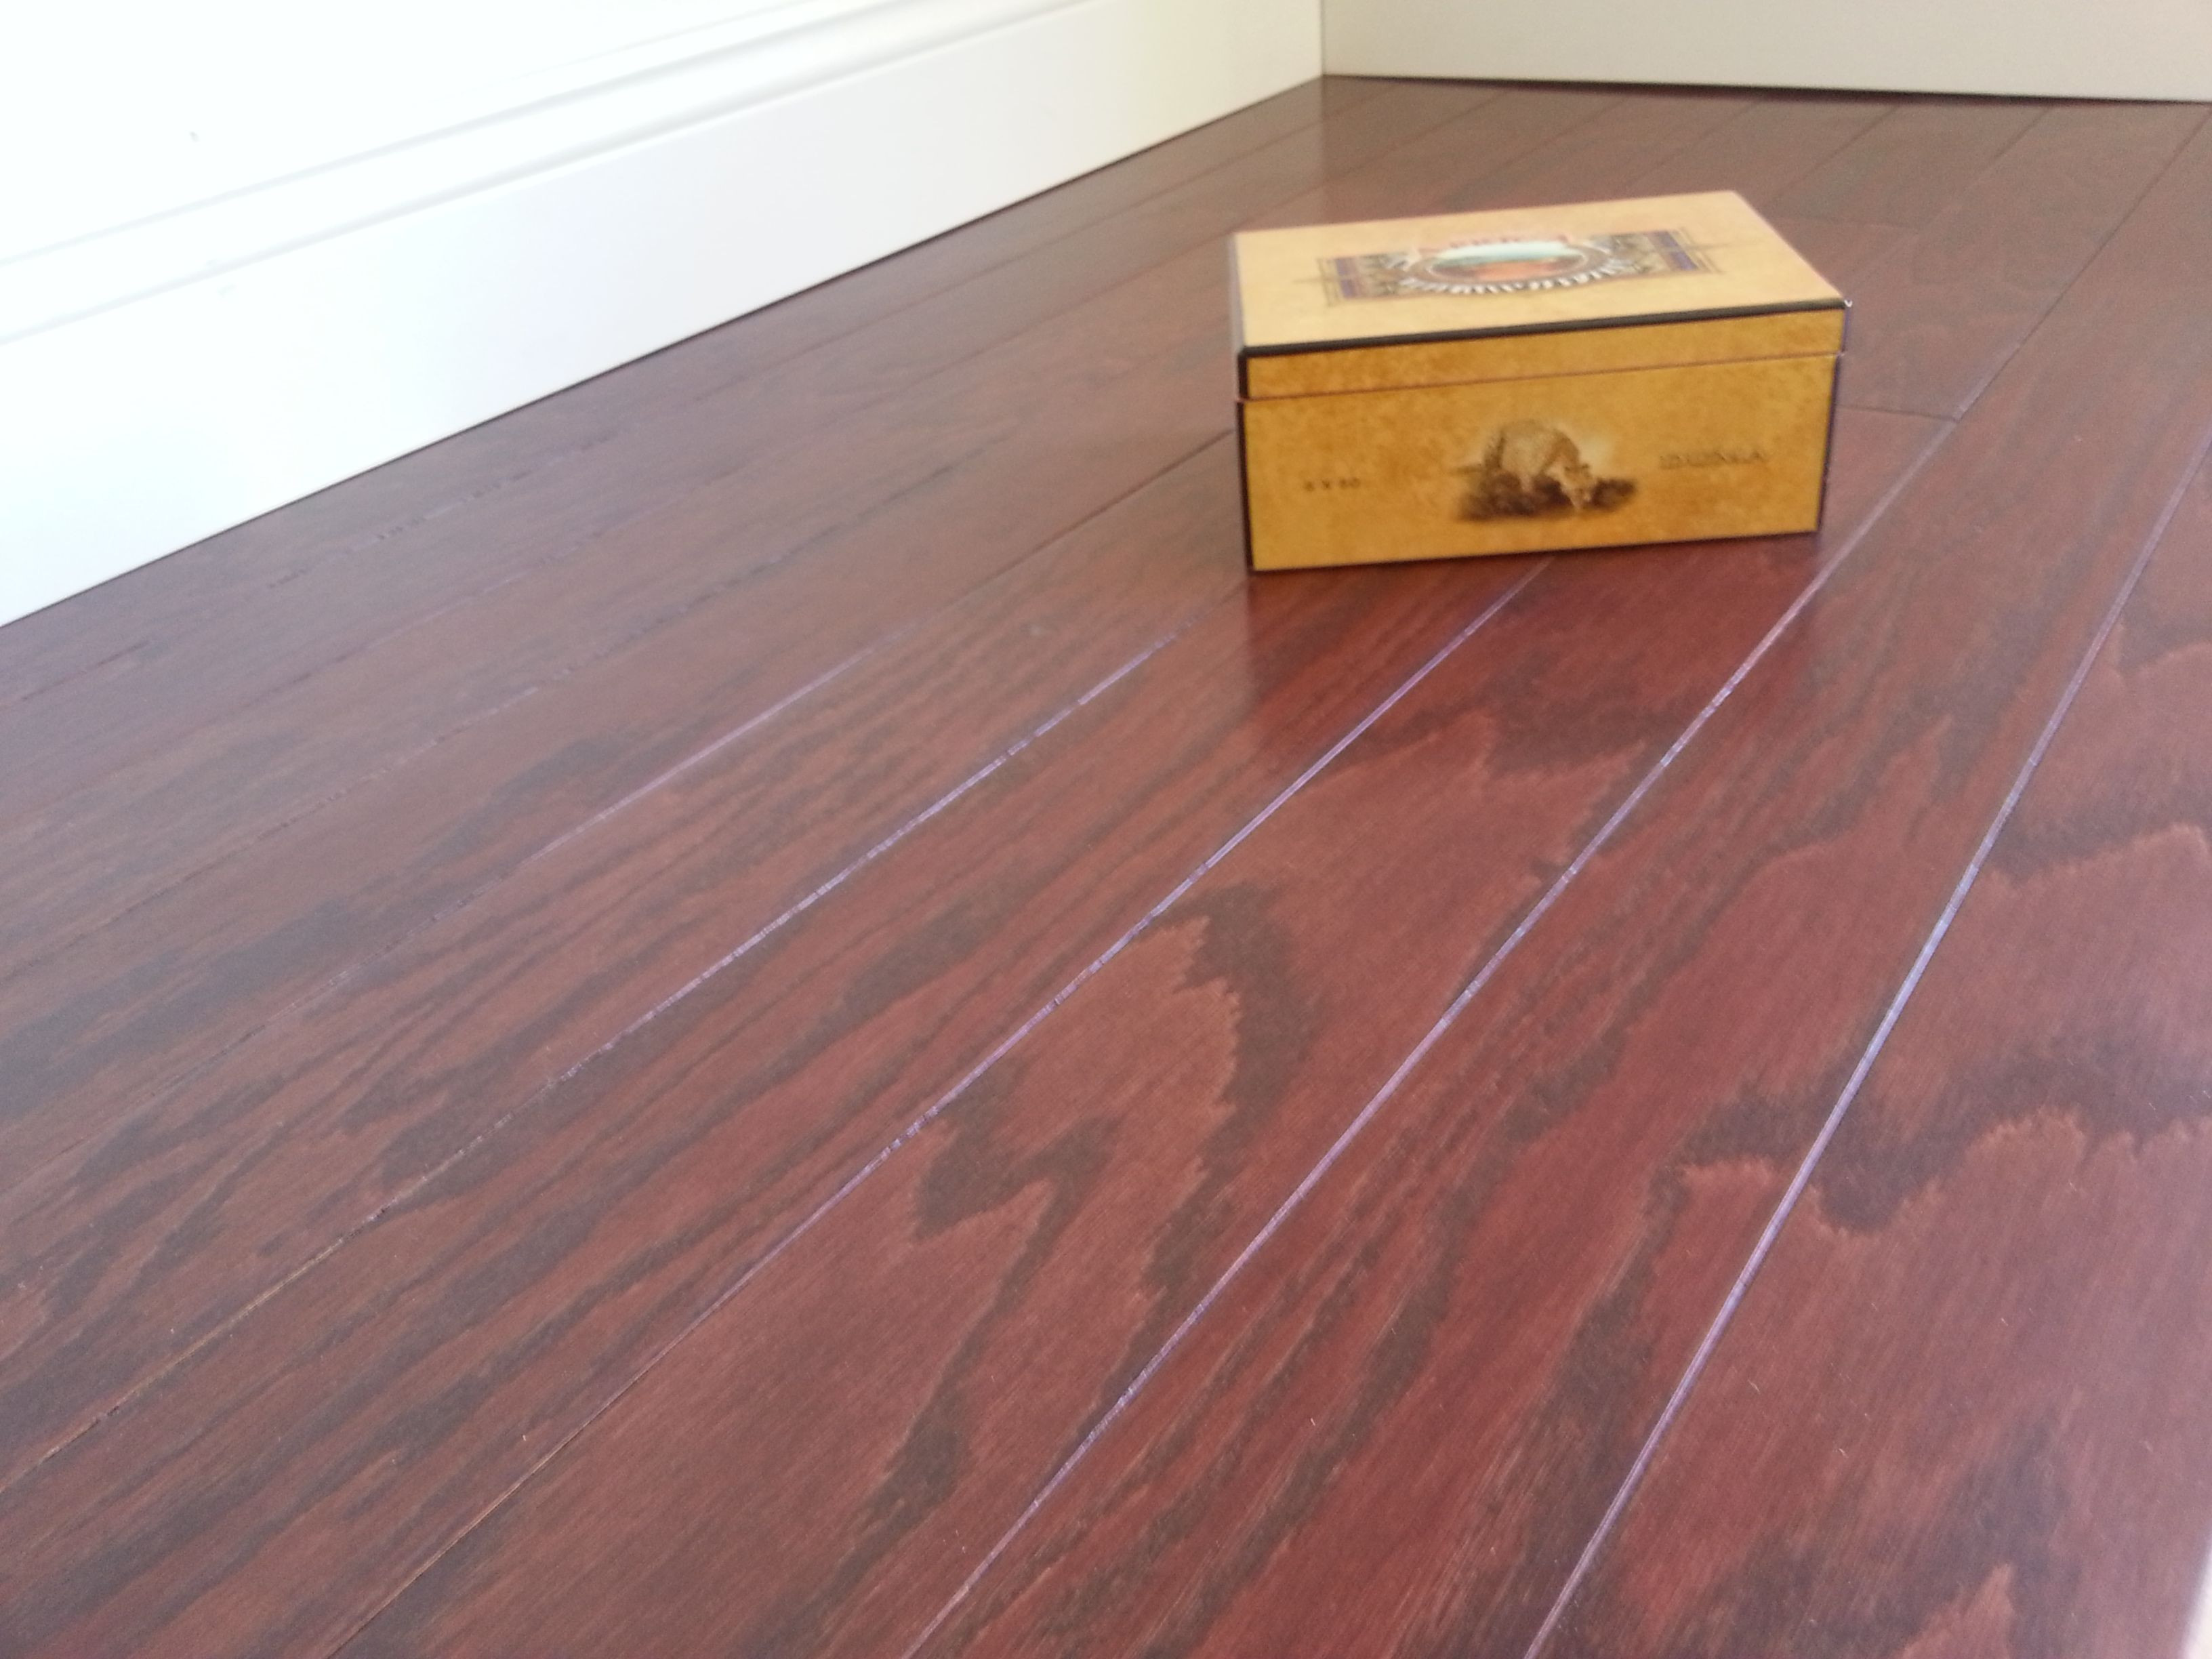 red oak hardwood flooring sale of 3 1 4 symphonic engineered oak merlot hardwood flooring as low as intended for 3 1 4 symphonic engineered oak merlot hardwood flooring as low as 3 23 sf